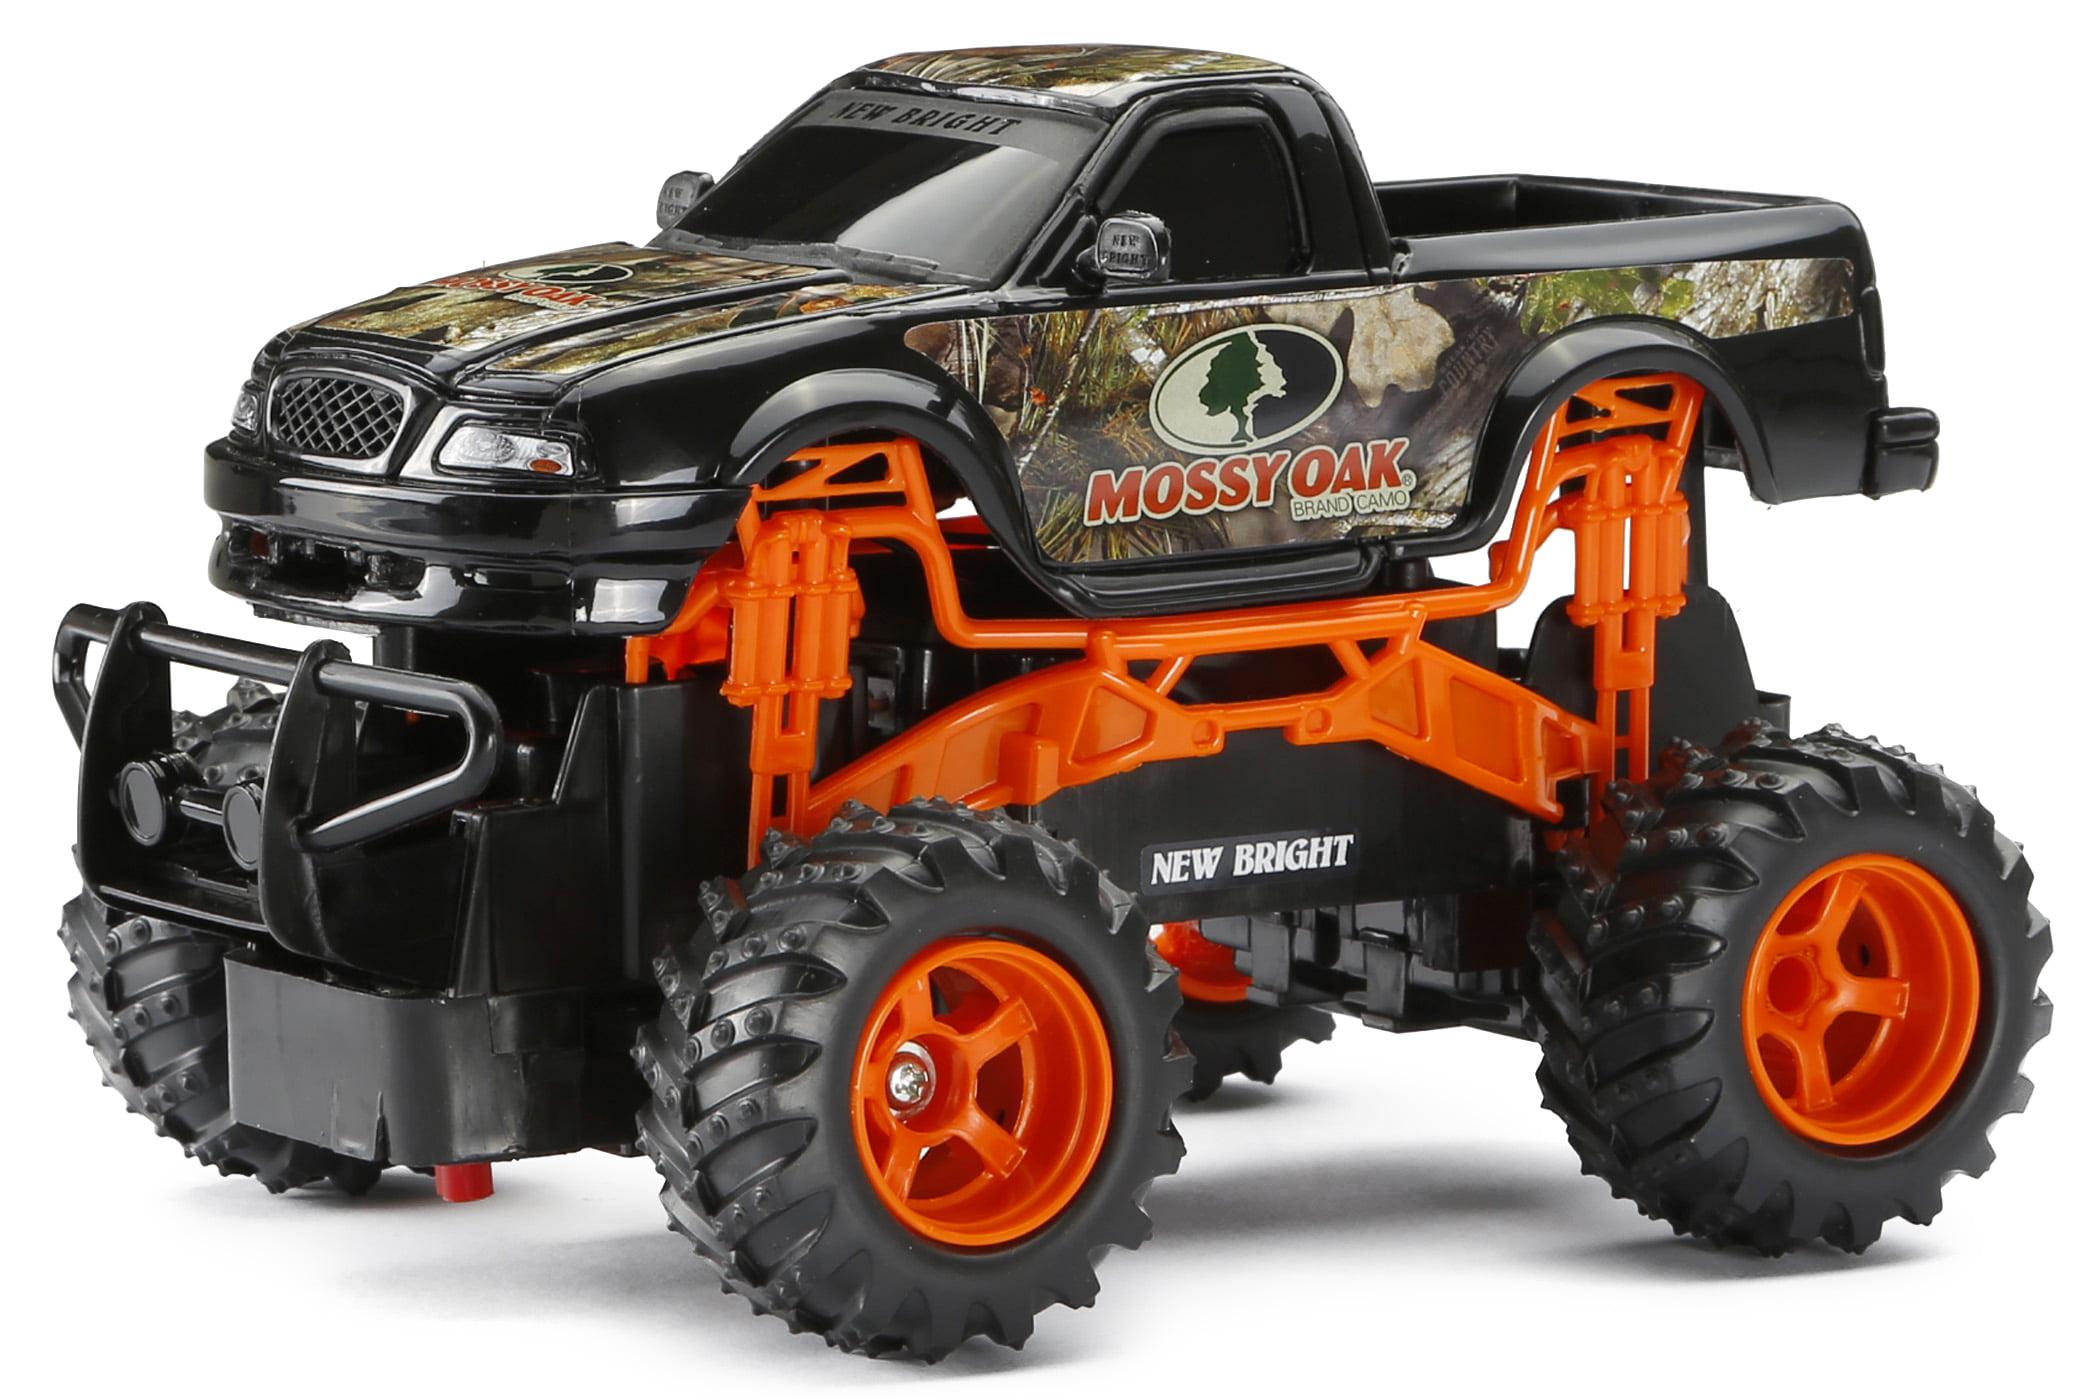 New Bright 1:24 Scale Radio Control Mossy Oak Truck - Walmart.com